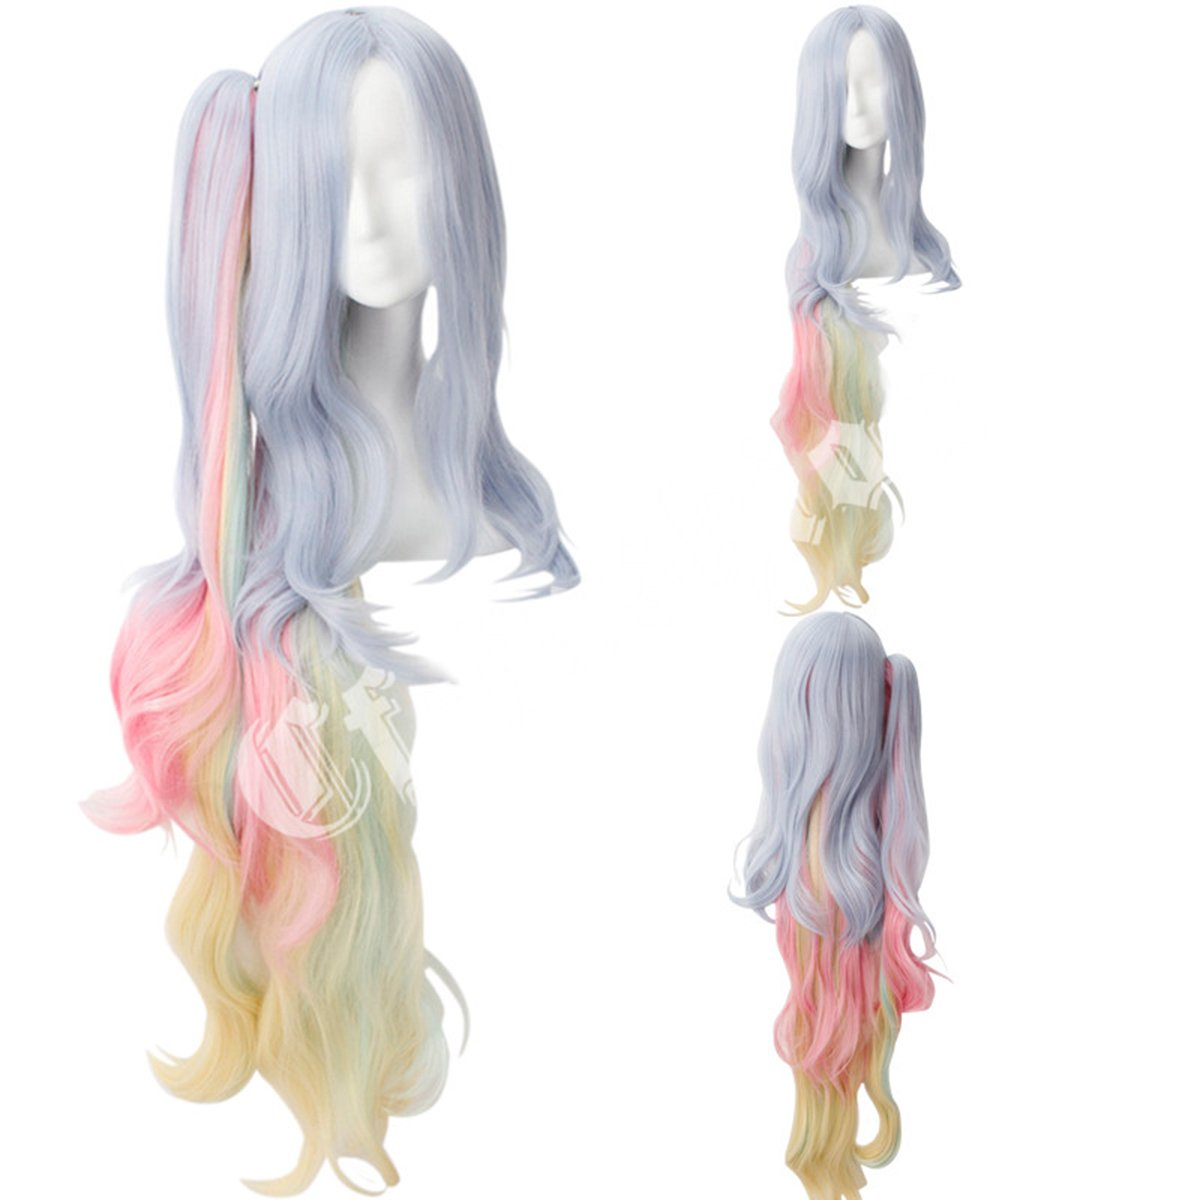 Cfalaicos No Game No Life Rainbow Color Long Wave Cosplay Hair Wig by Cfalaicos